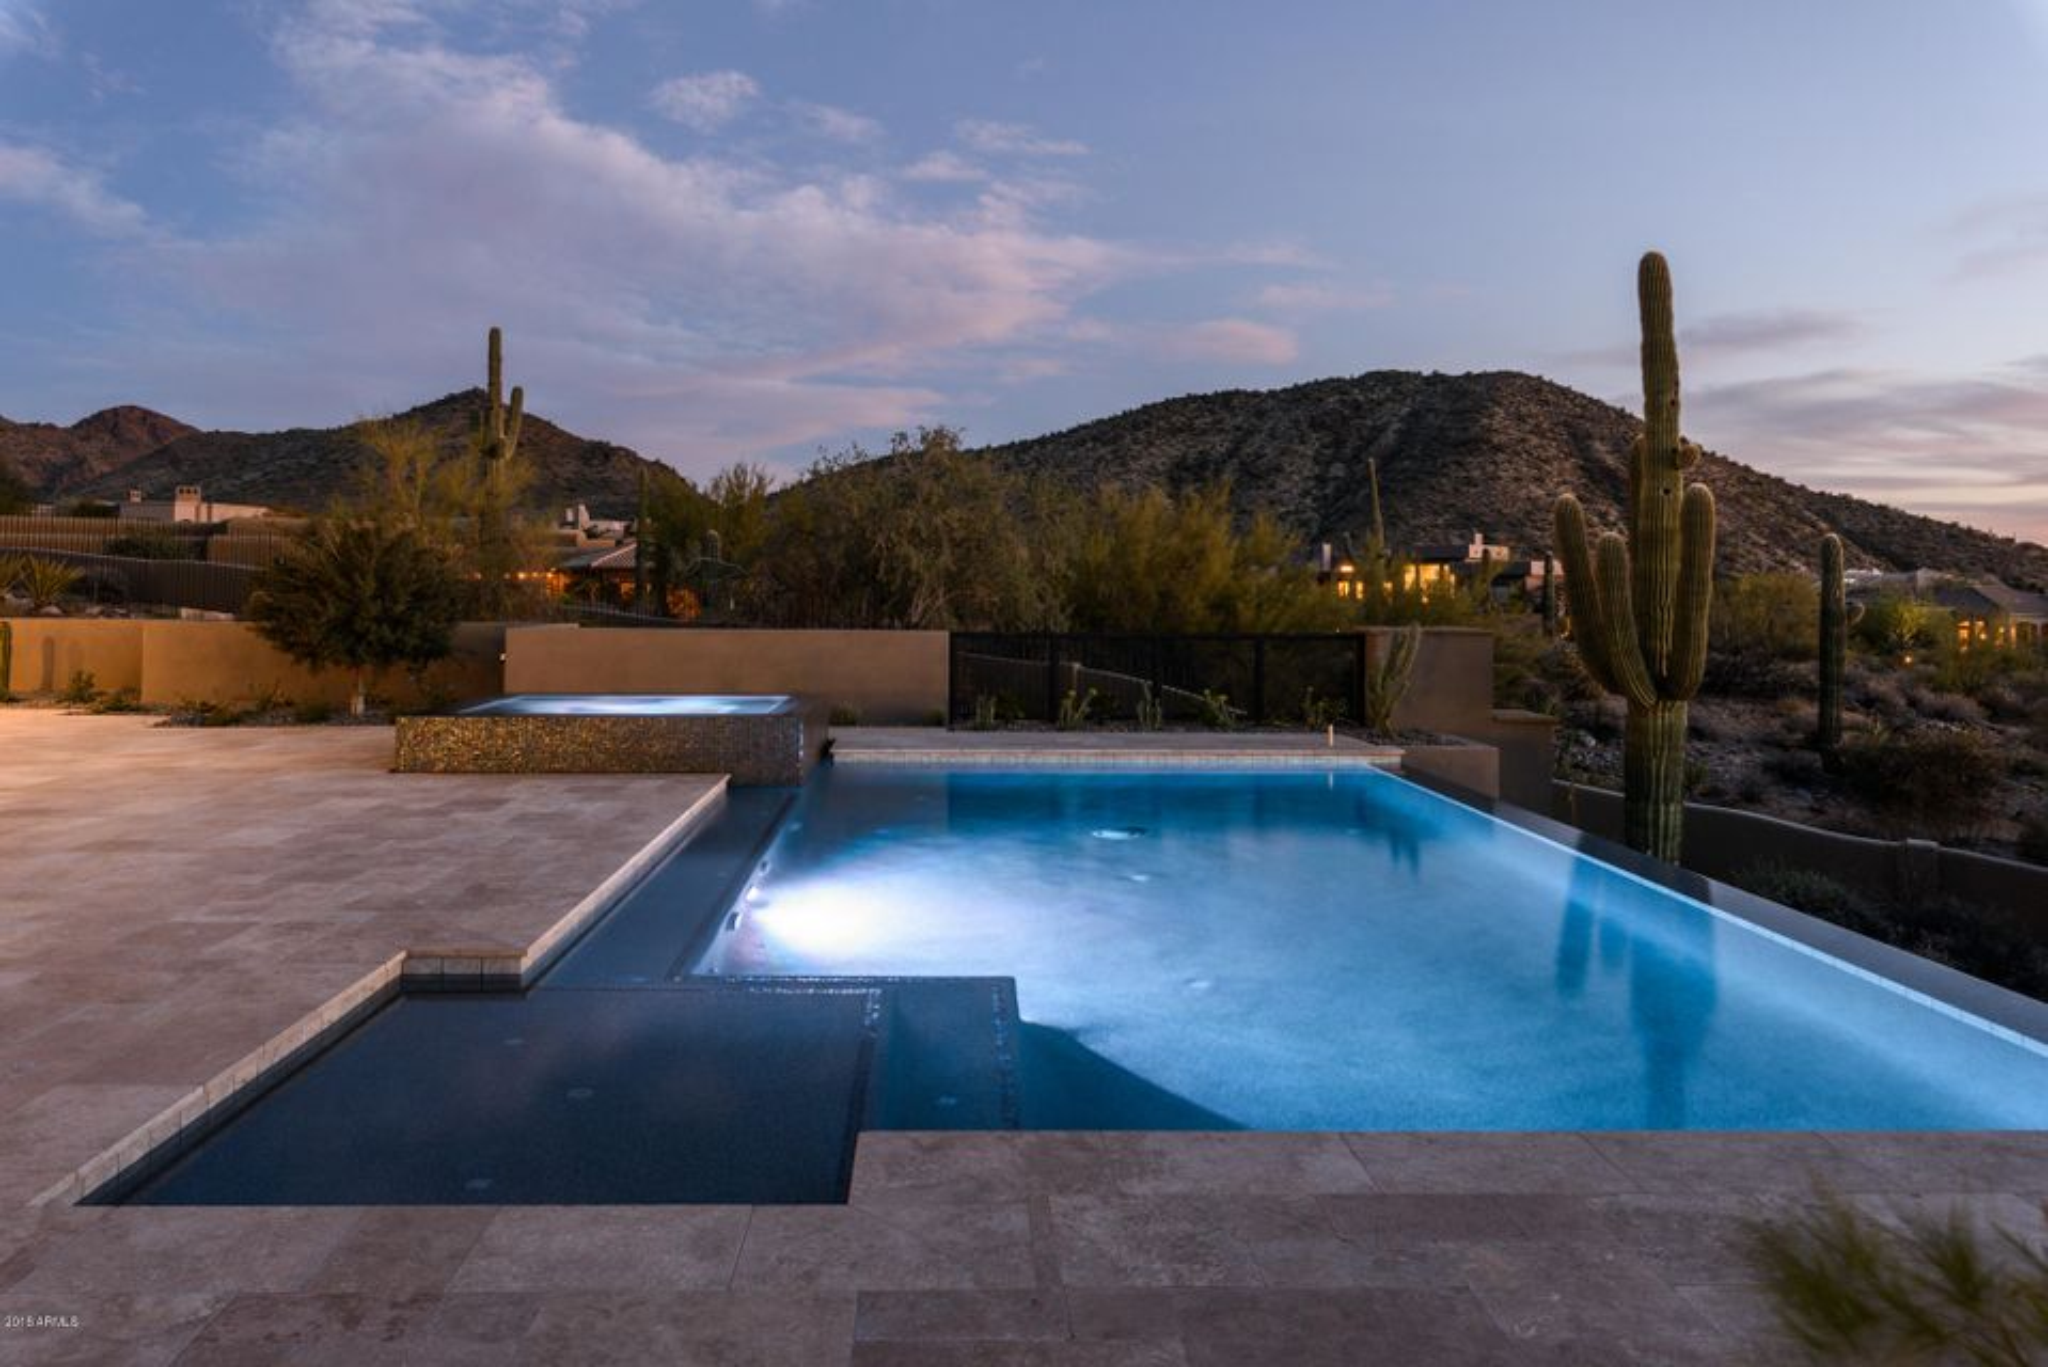 MLS 5675350 10801 E Happy Valley Road Unit 40, Scottsdale, AZ 85255 Scottsdale AZ Troon